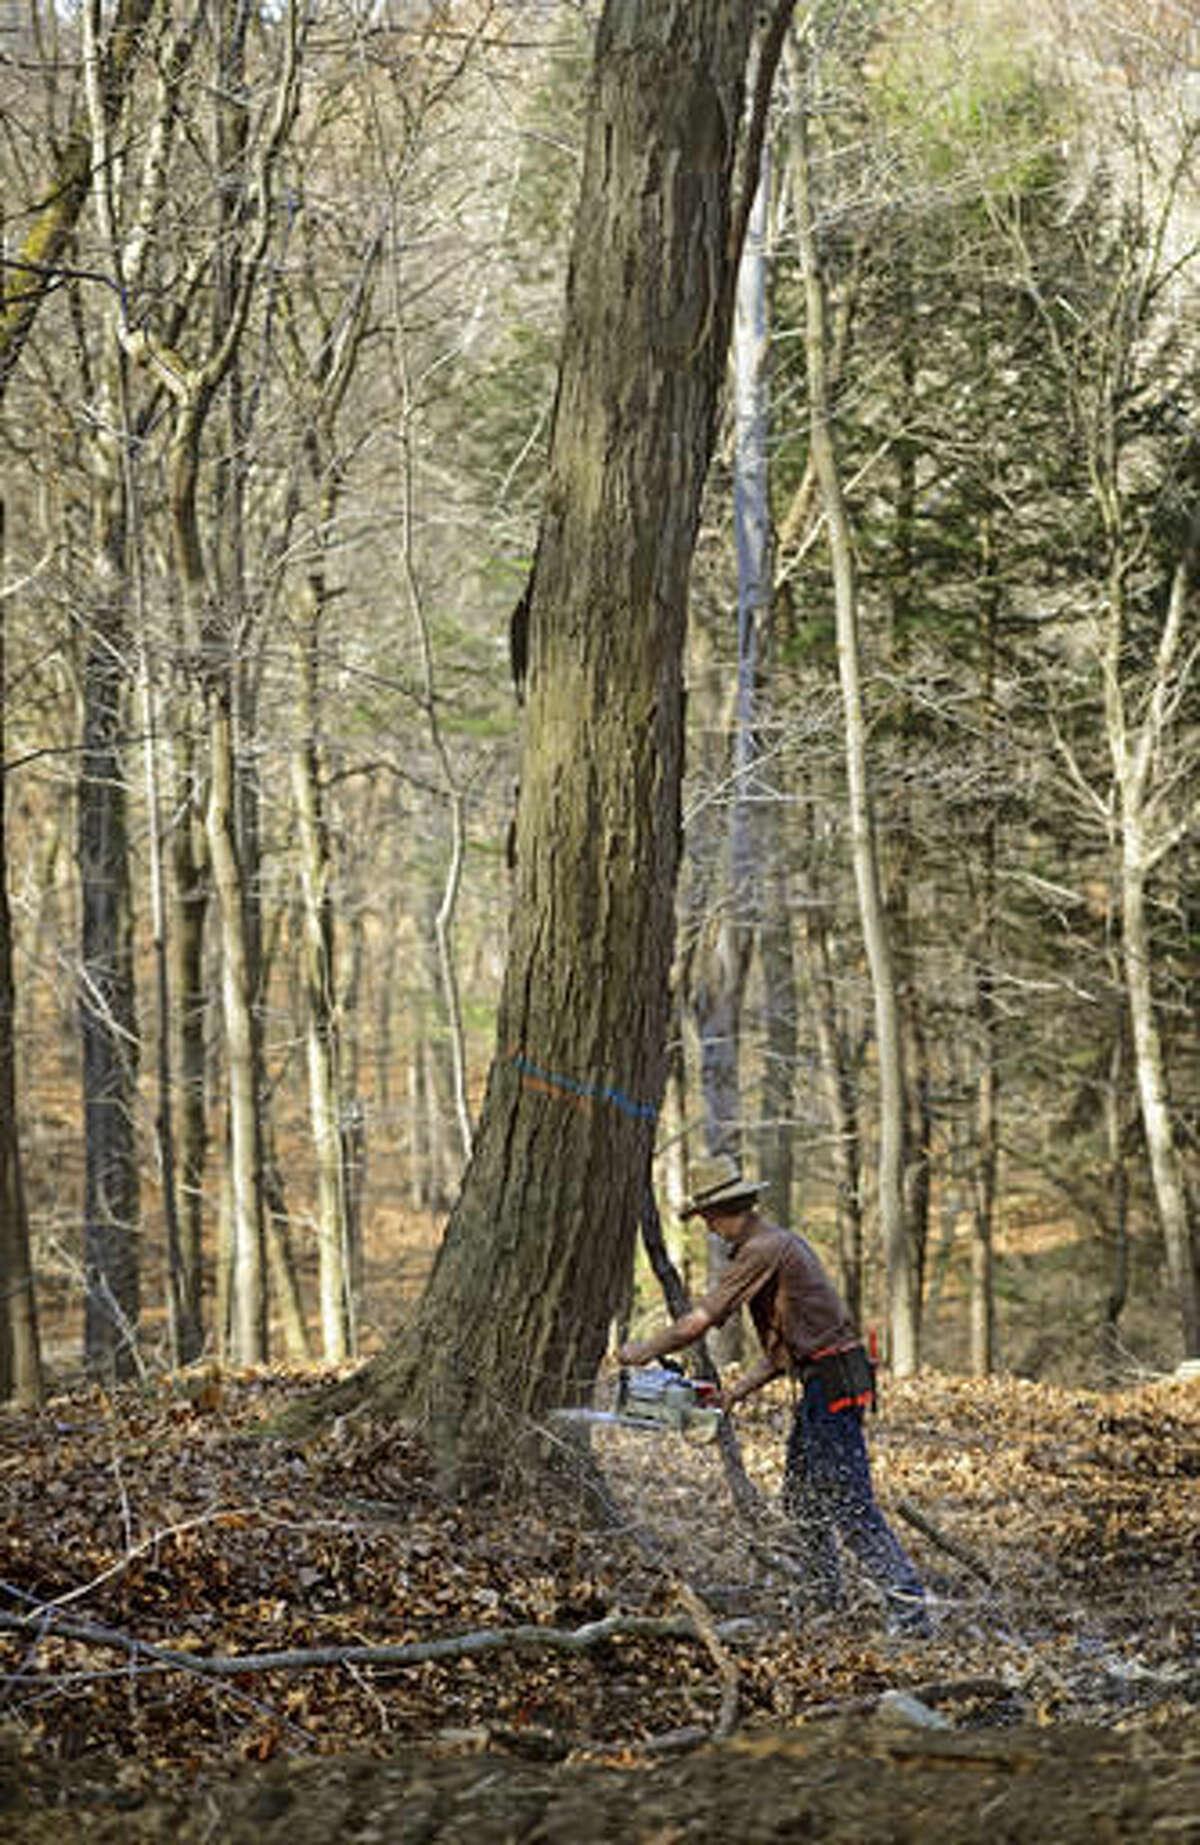 In this Tuesday, Nov. 15, 2016 photo, John Miller, of Dayton, works on harvesting a mature hardwood tree while logging in Lower Burrell, Pa. (Louis B. Ruediger /Pittsburgh Tribune-Review via AP)